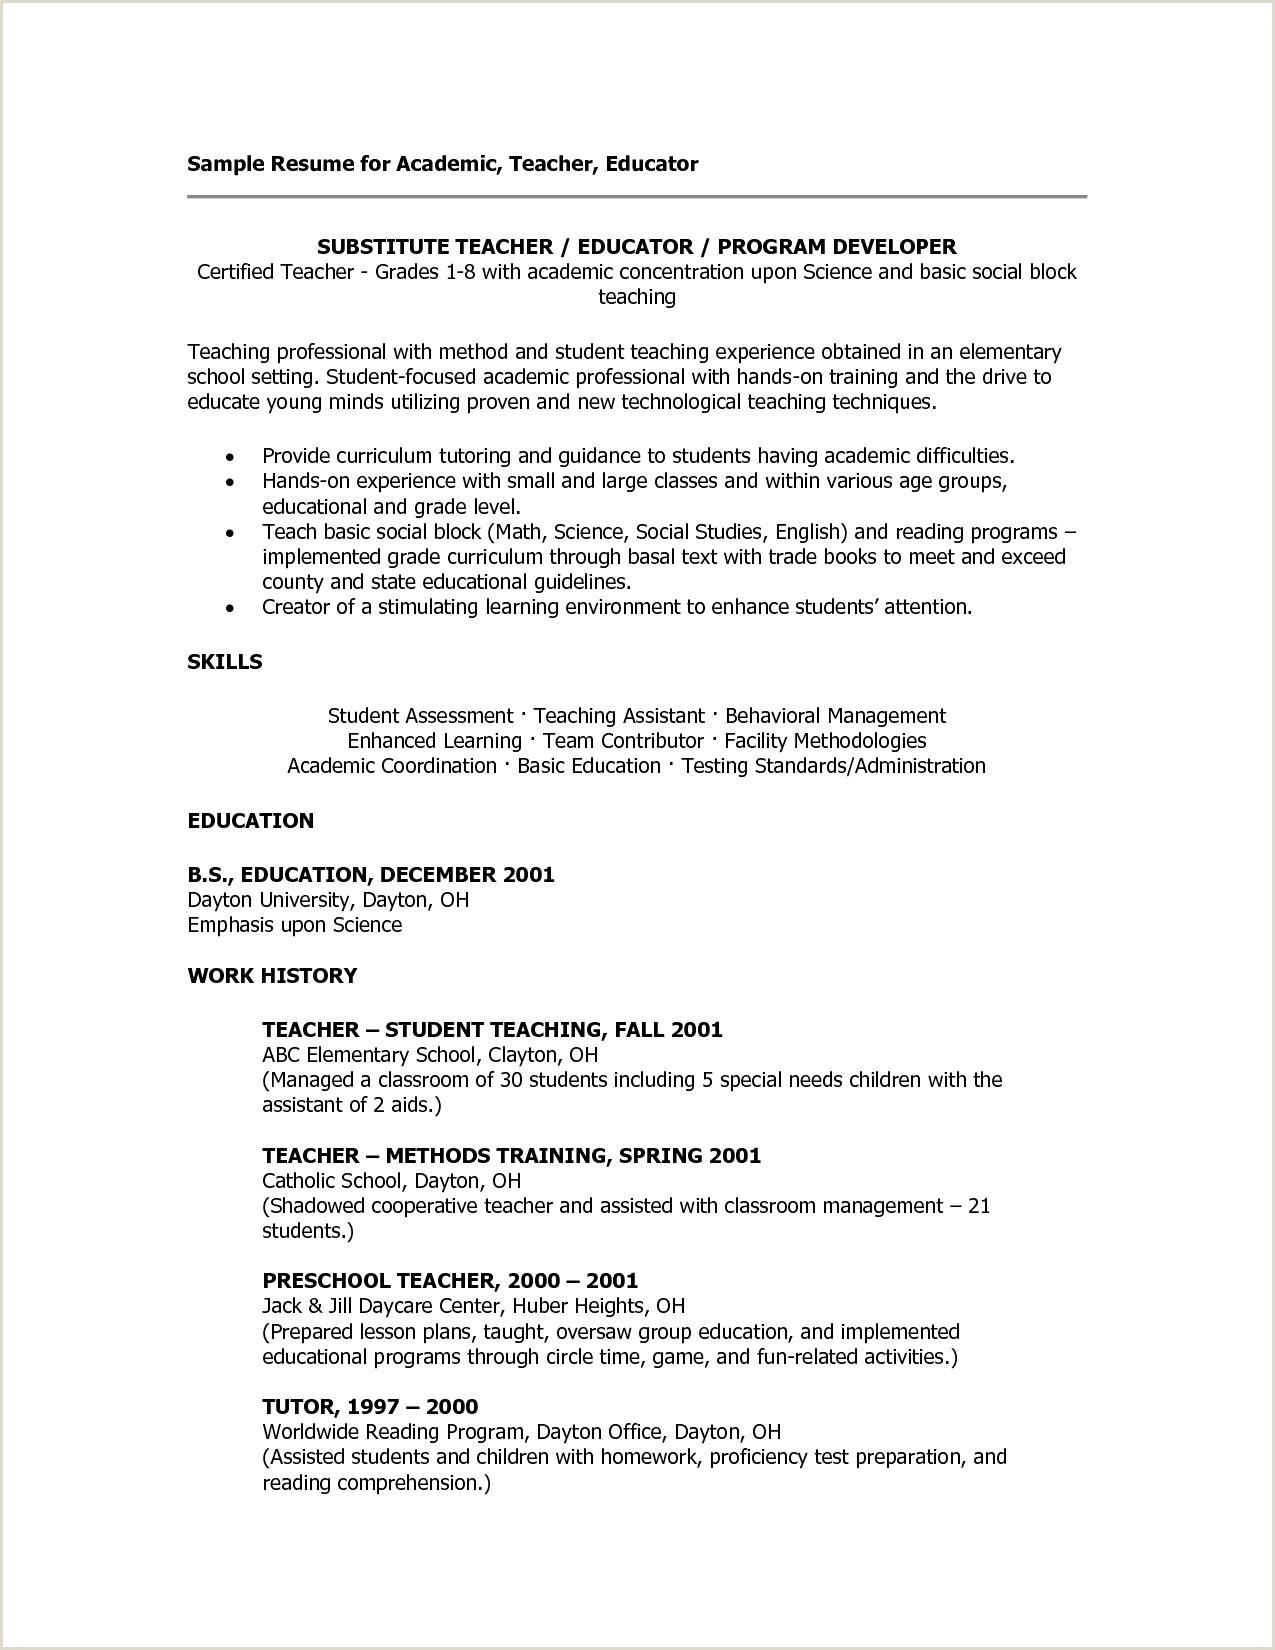 Sample Child Care Resume Enhance Cv Francais Nouveau Sample Child Care Resume Cover